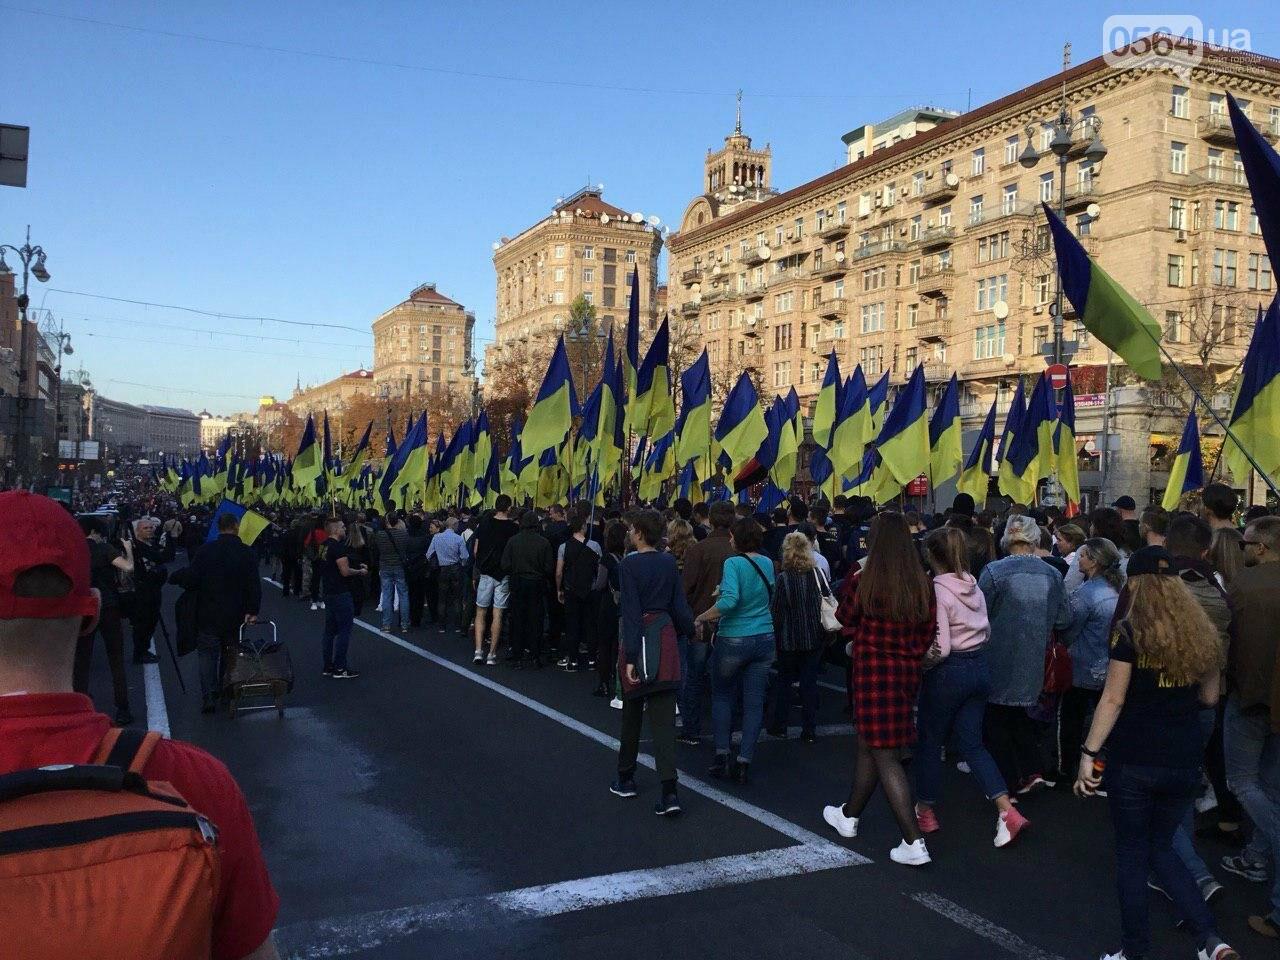 Криворожане поддержали Марш сопротивления капитуляции в Киеве, - ФОТО, ВИДЕО, ОБНОВЛЕНО, фото-16